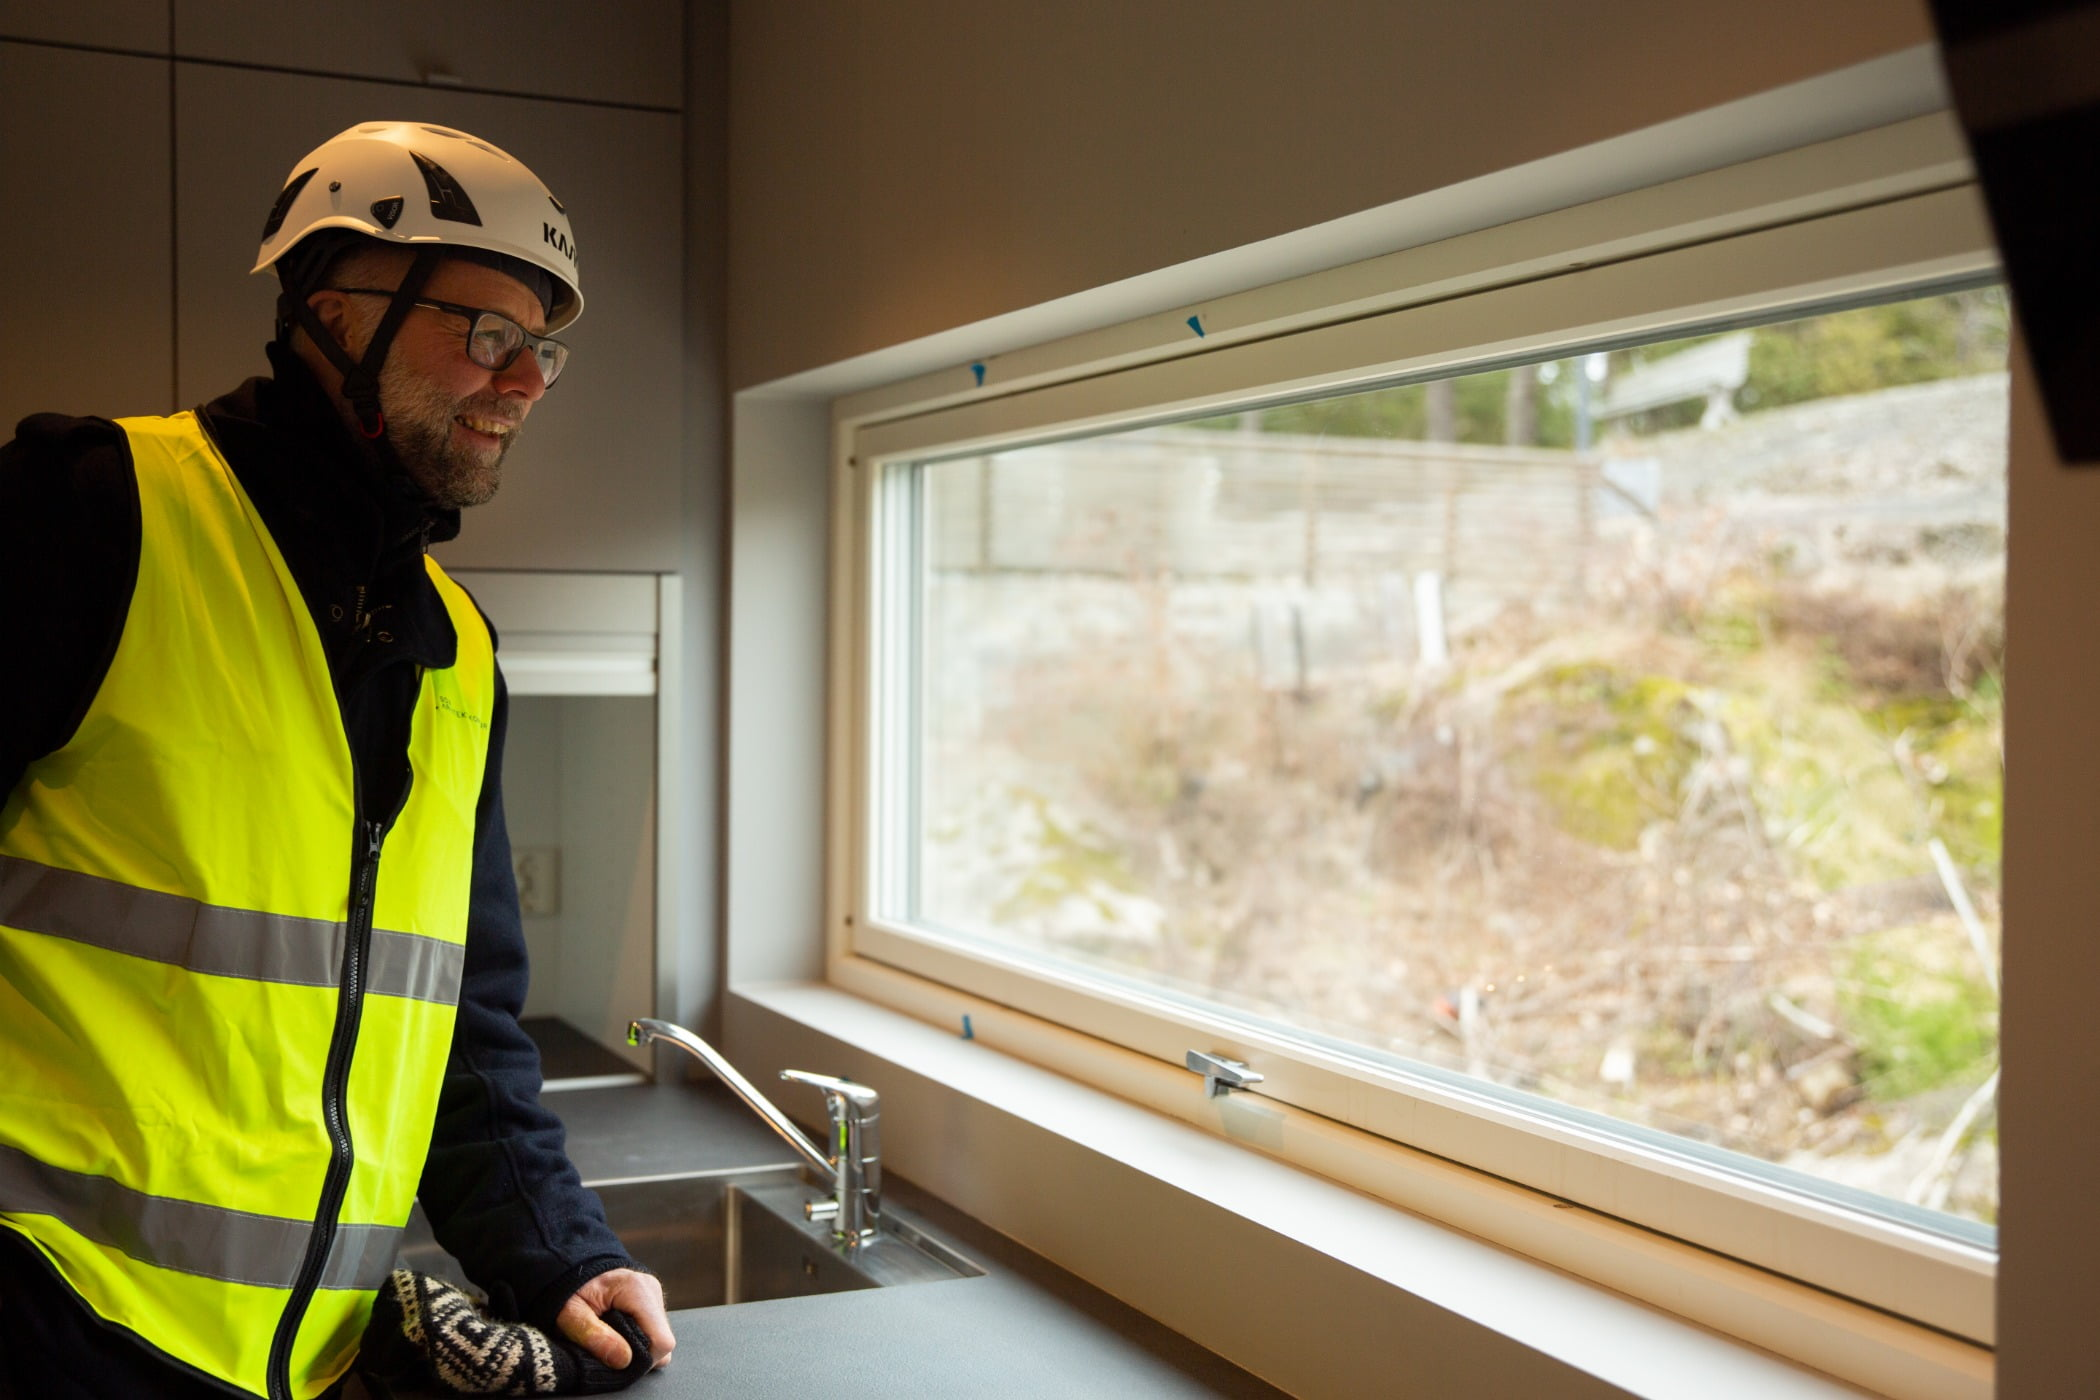 Hard hat, High-visibility clothing, Window, Workwear, Fixture, Tradesman, Sleeve, Yellow, Helmet, Engineer